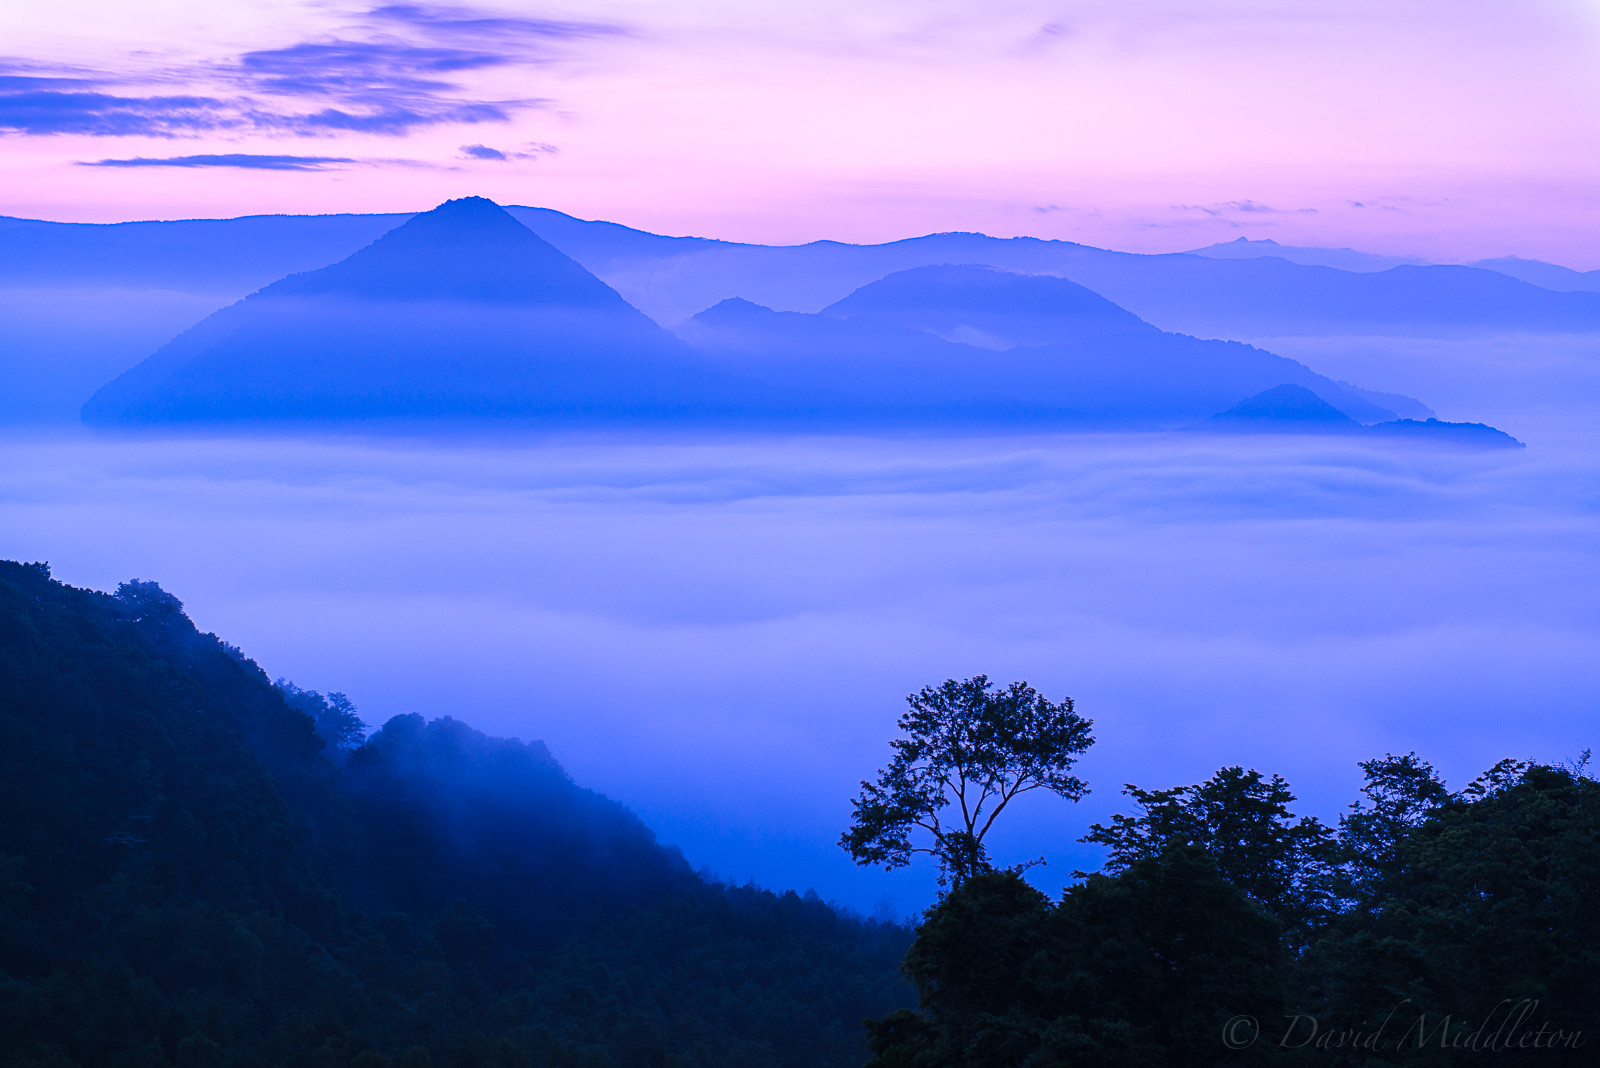 Fog Covering Lake Toya